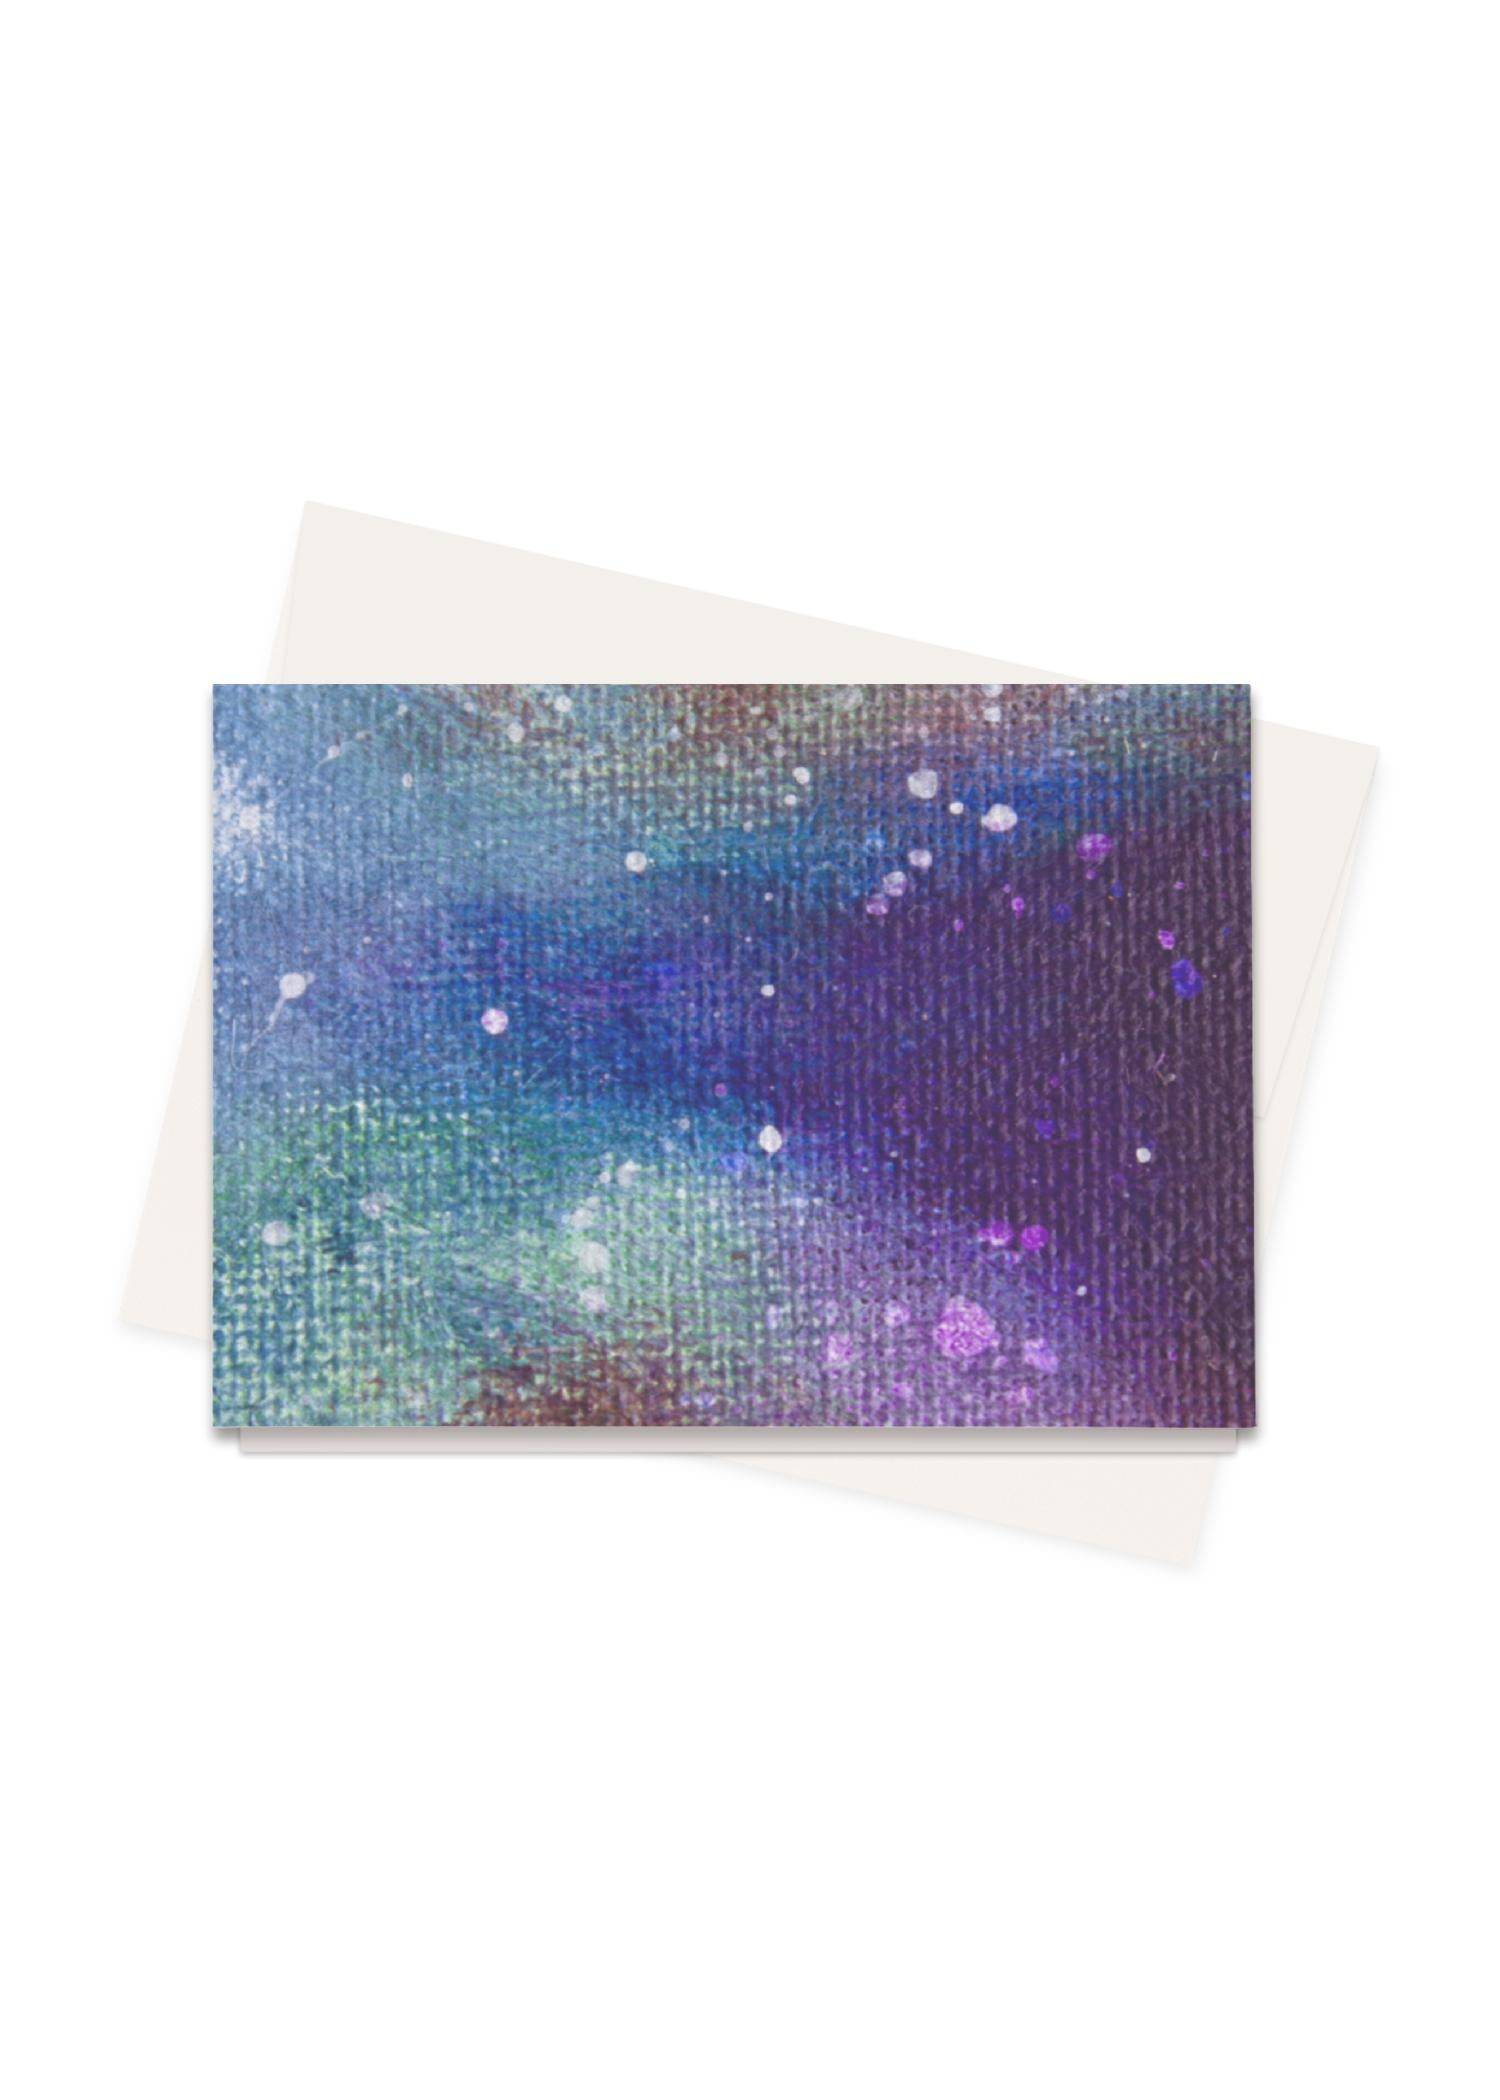 VIDA Greeting Cards Set - Cosmo Pillow in Blue/Purple by VIDA Original Artist  - Size: Set of 16